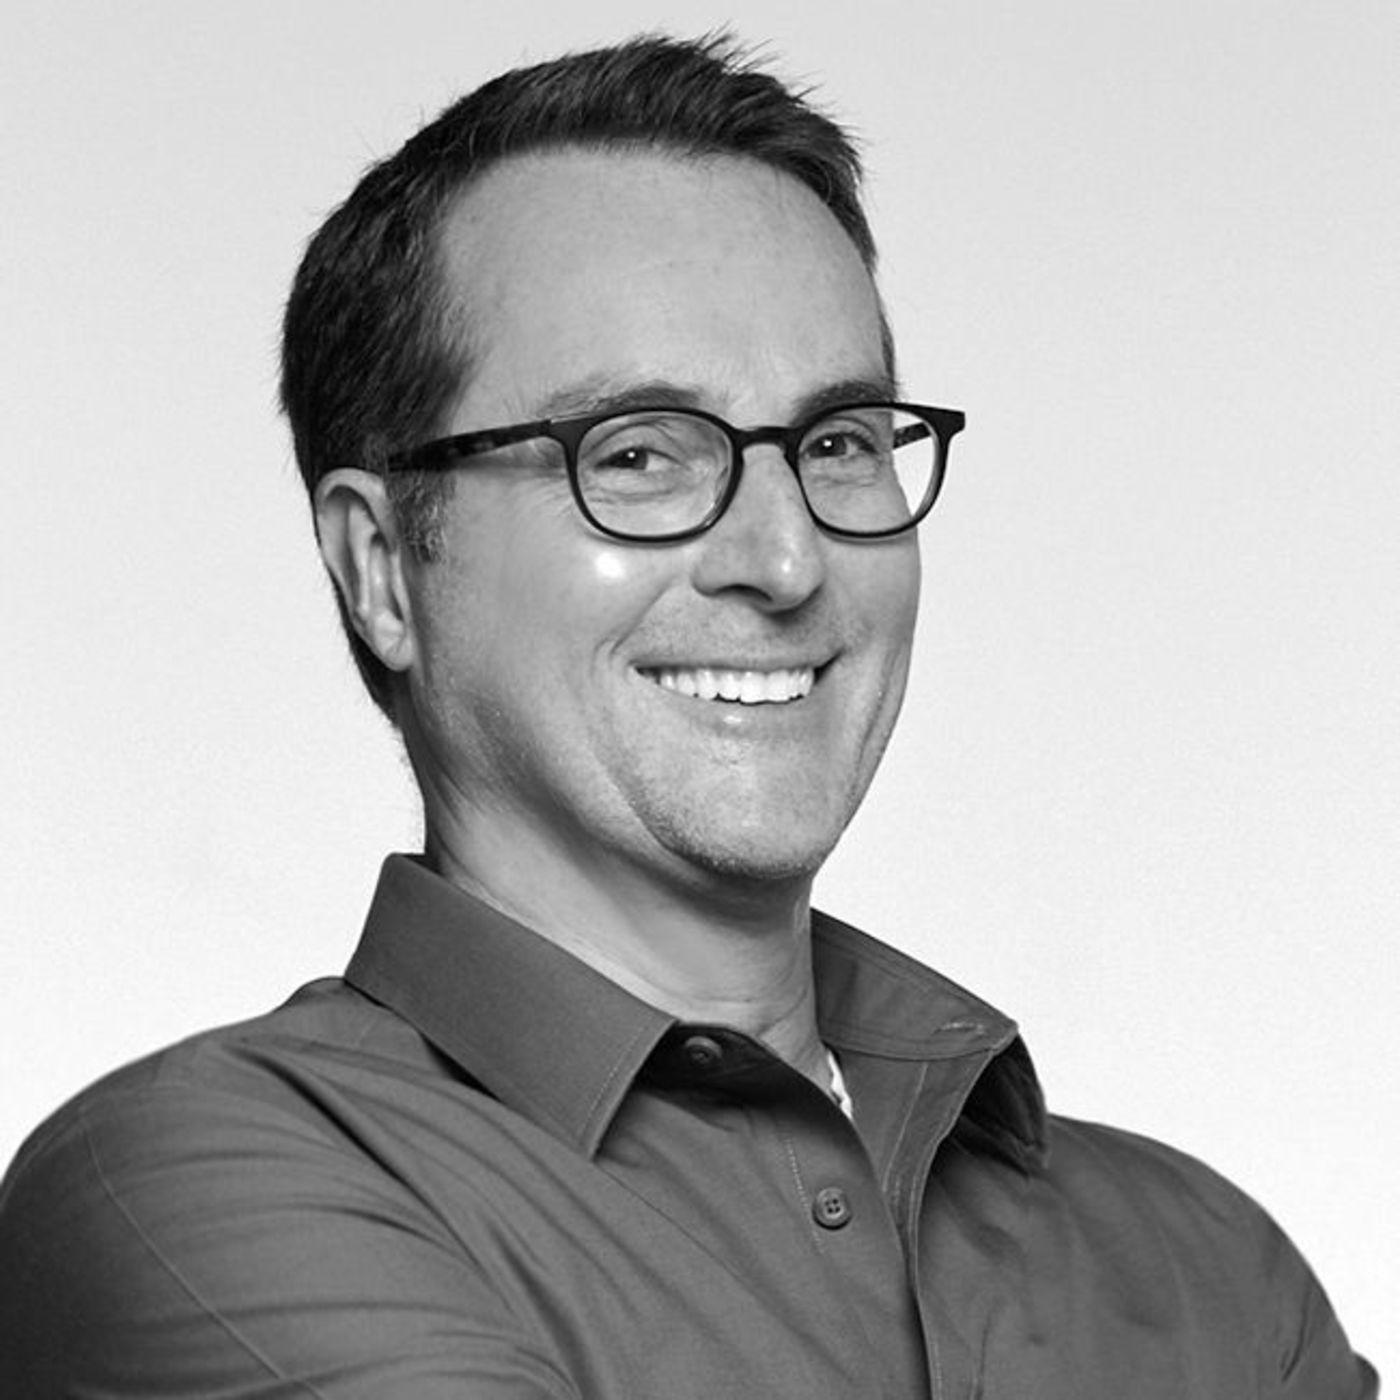 David Vogler: Making media on the cutting edge